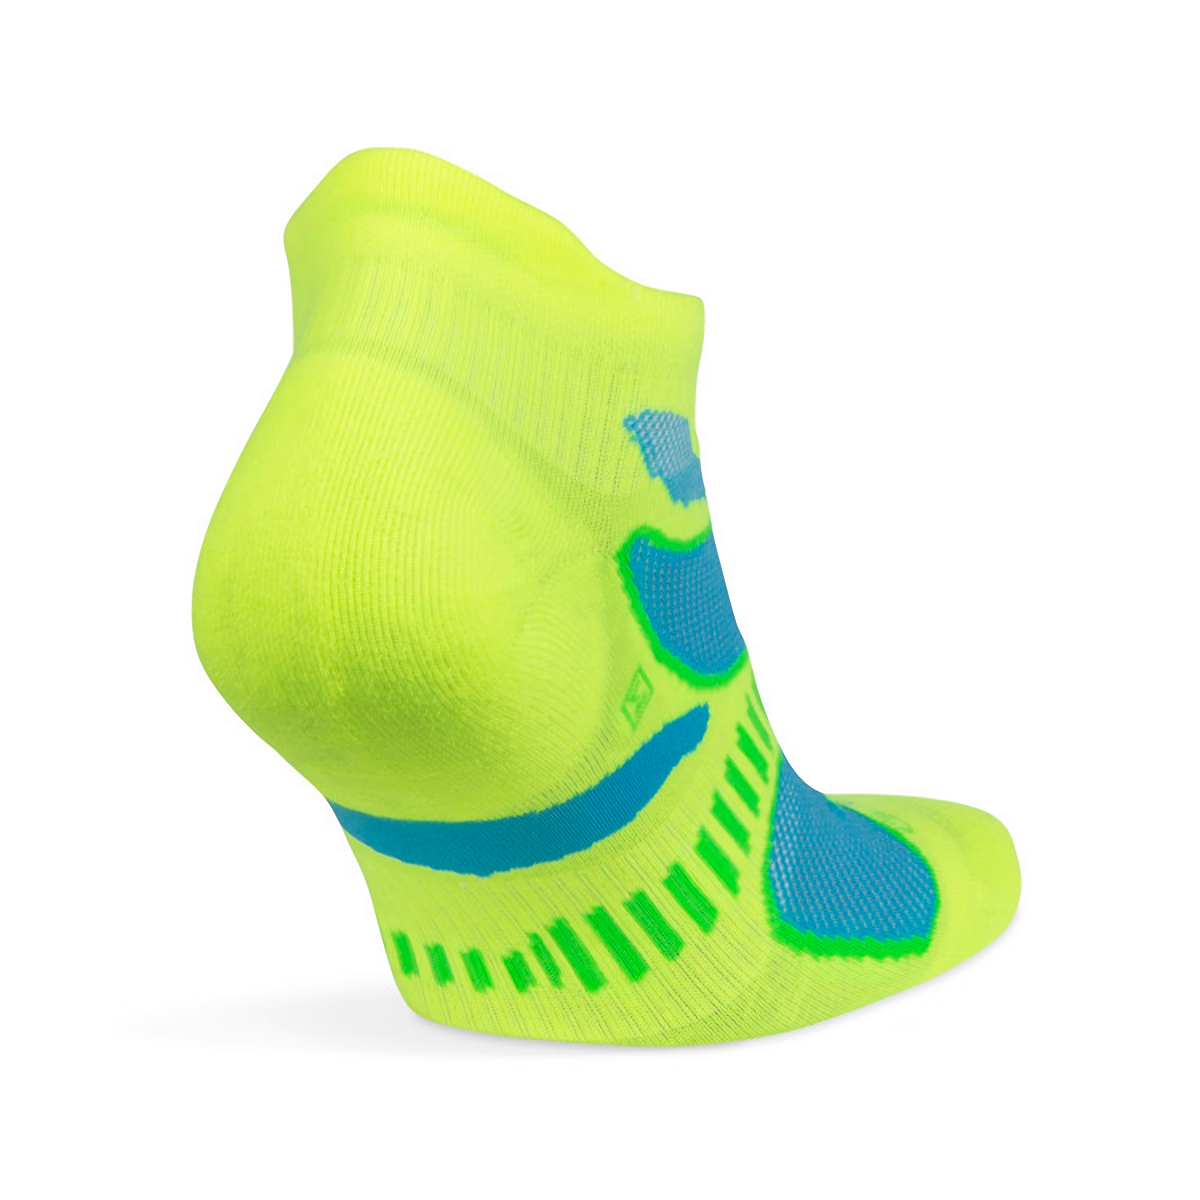 Balega Ultra Light No Show Tab Socks - Color: Neon Lime - Size: S, Neon Lime, large, image 3